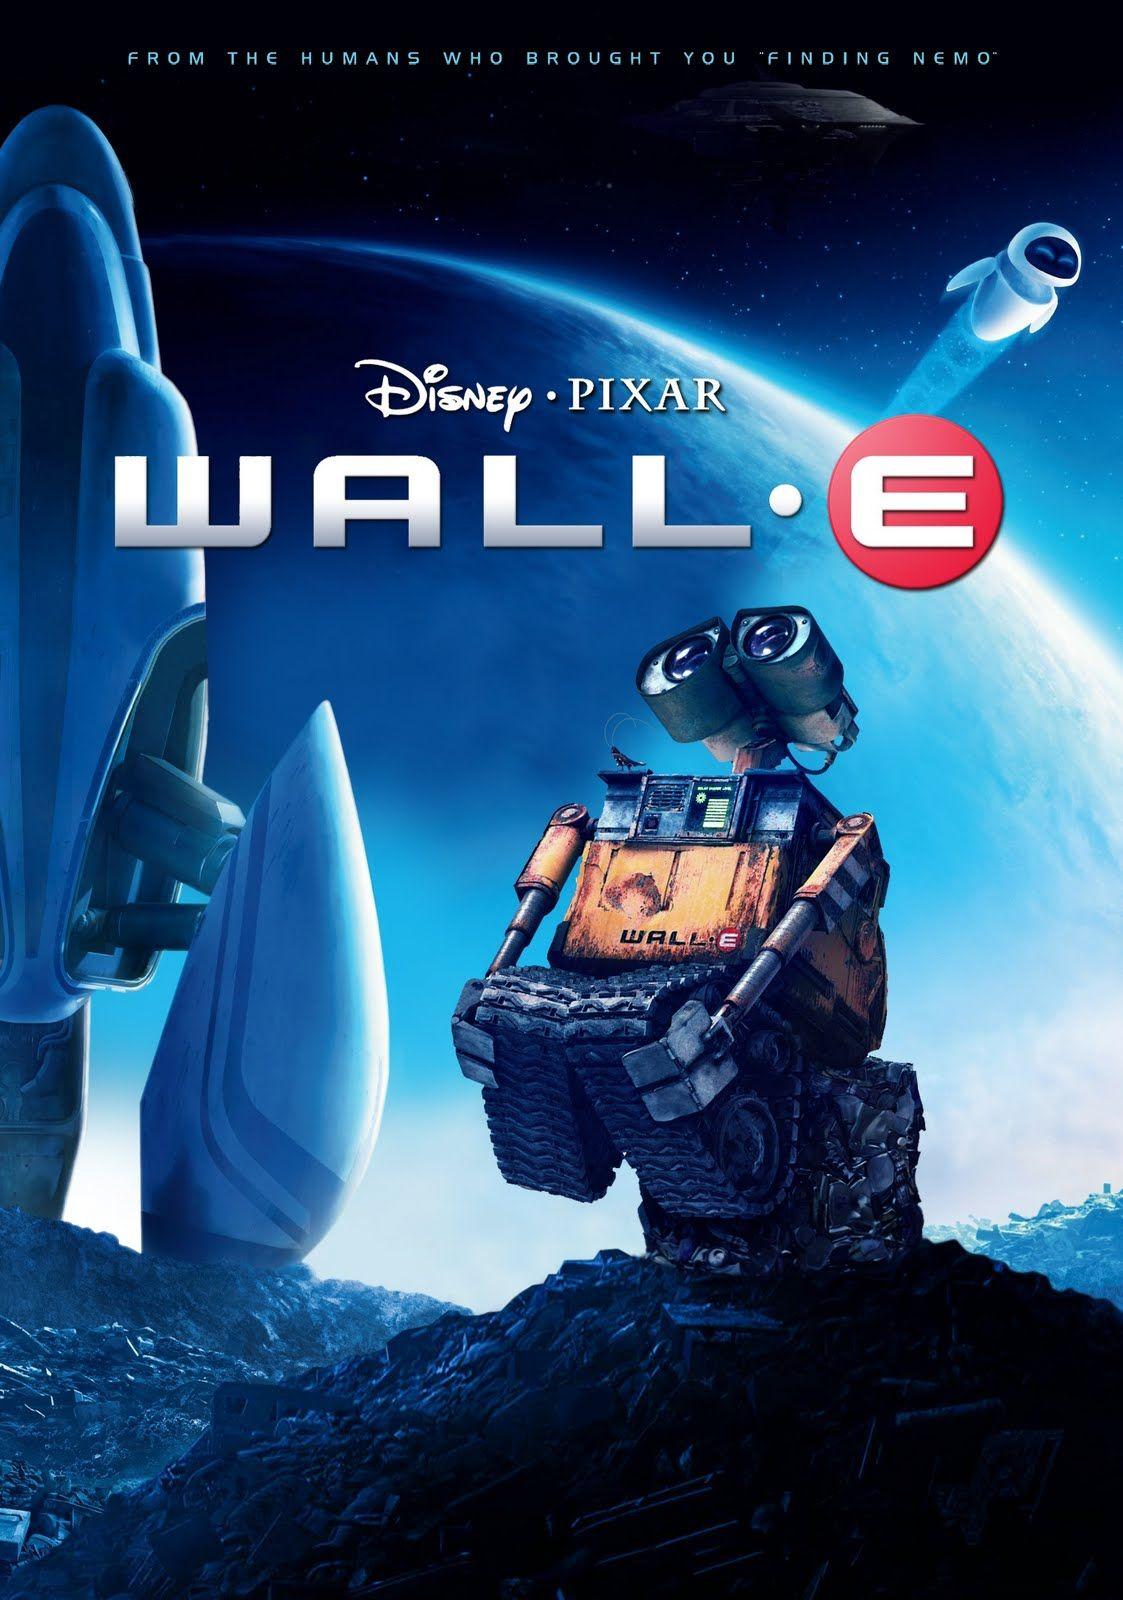 Wall E 2008 Sci Fi Adventure Dir Andrew Stanton Adventure Movies Wall E Movie Disney Films